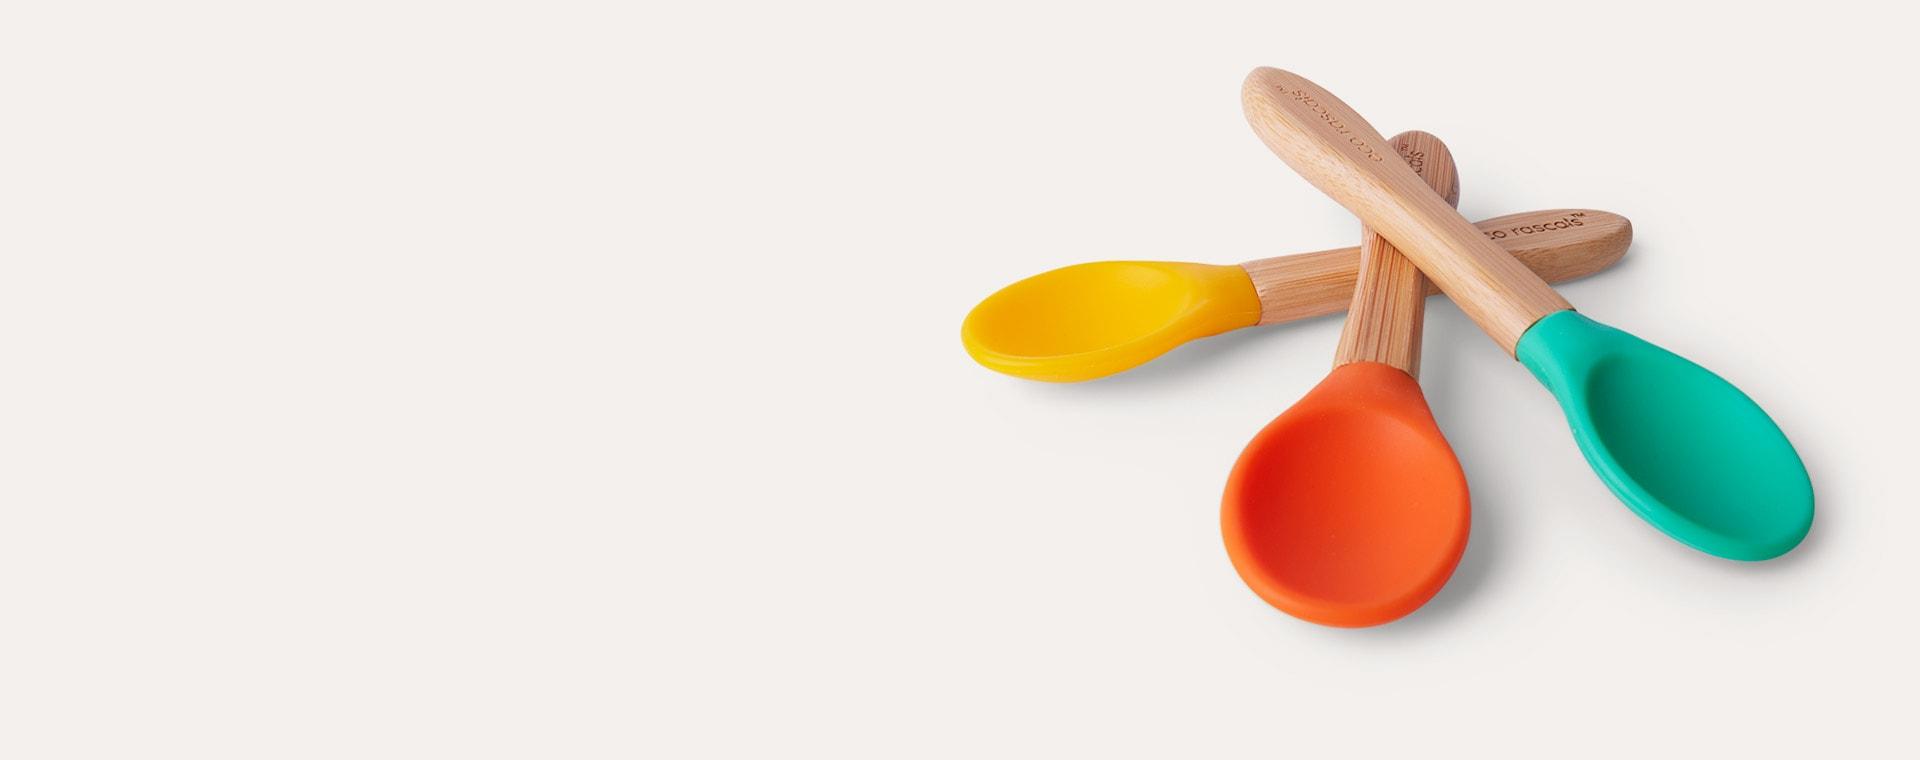 Green/ Orange/ Yellow eco rascals 3-Pack Bamboo Spoons